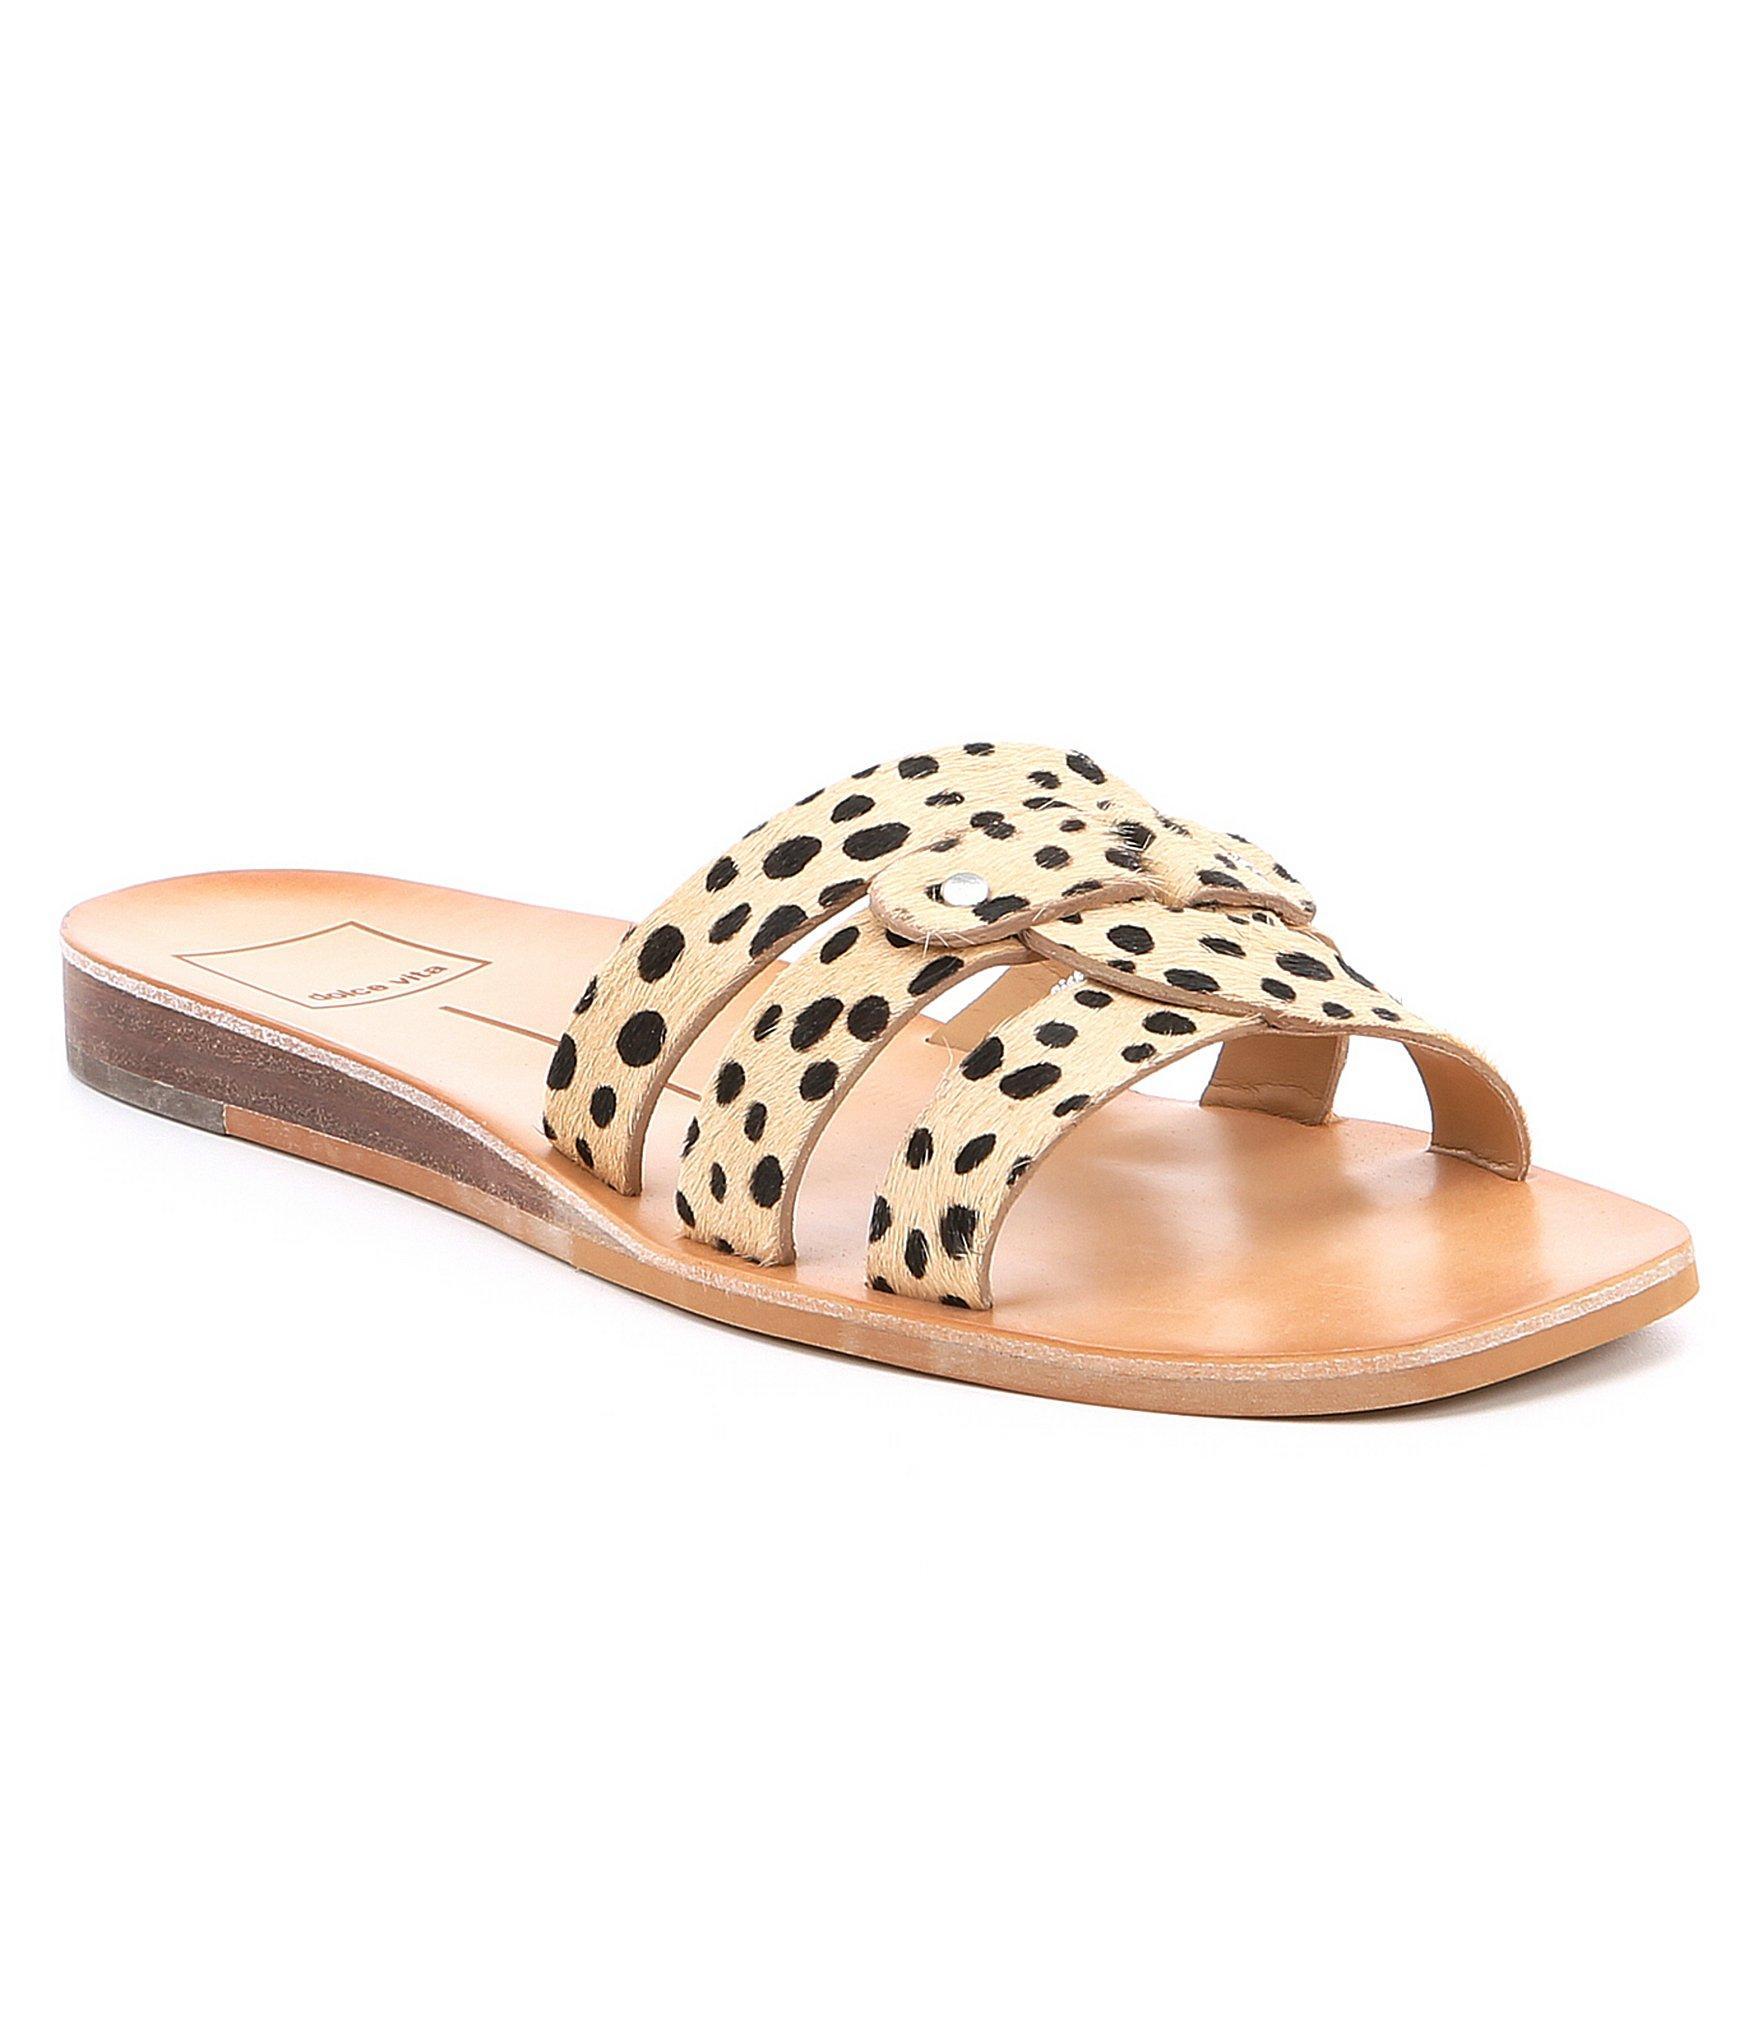 46fedb41fcb Lyst - Dolce Vita Cait Leopard Print Wedge Sandals